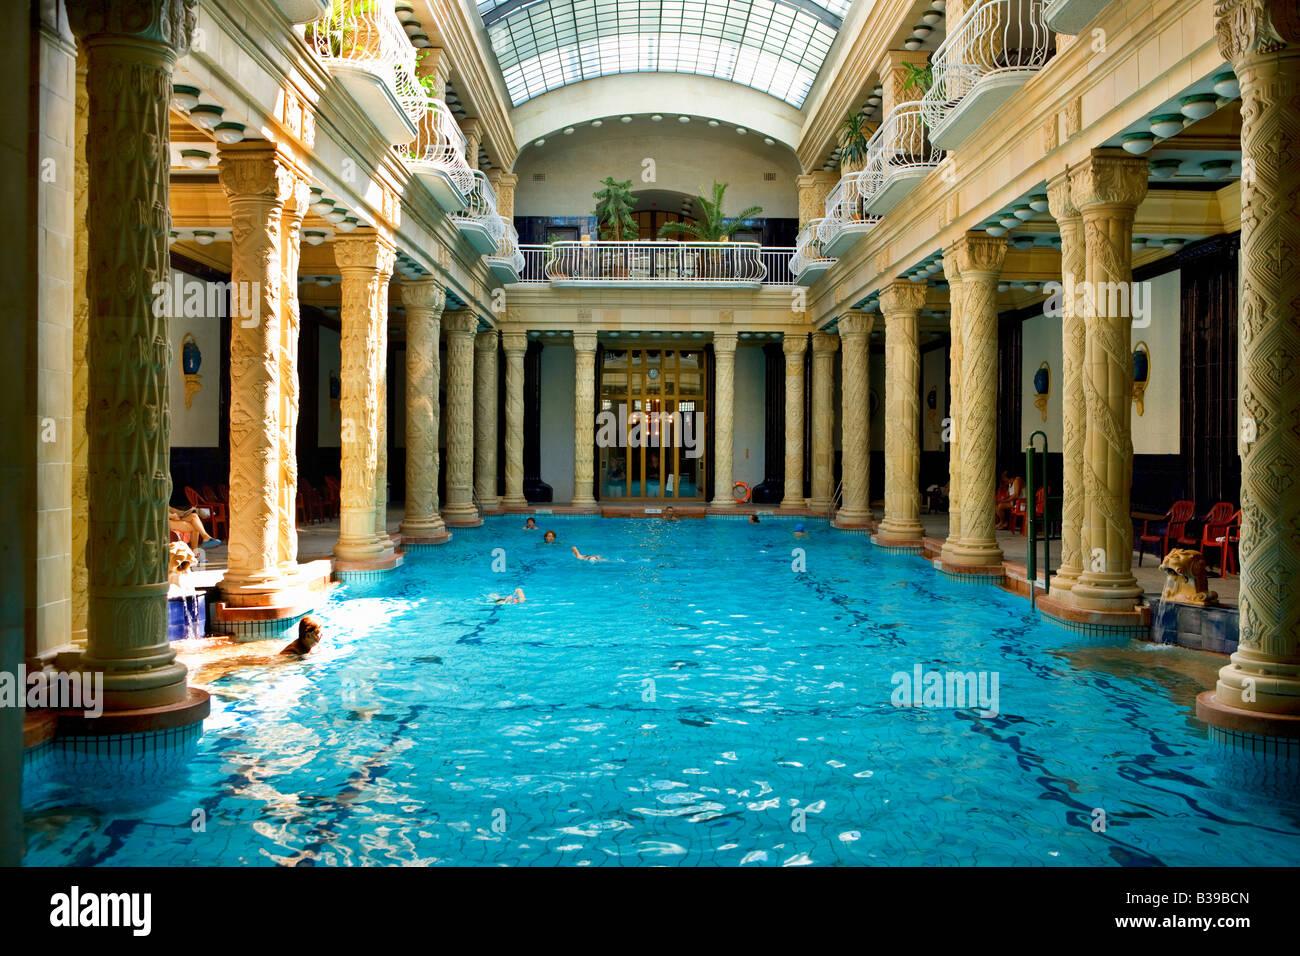 Bagni Termali Gellert : Bagno termale gellert budapest ungheria foto & immagine stock